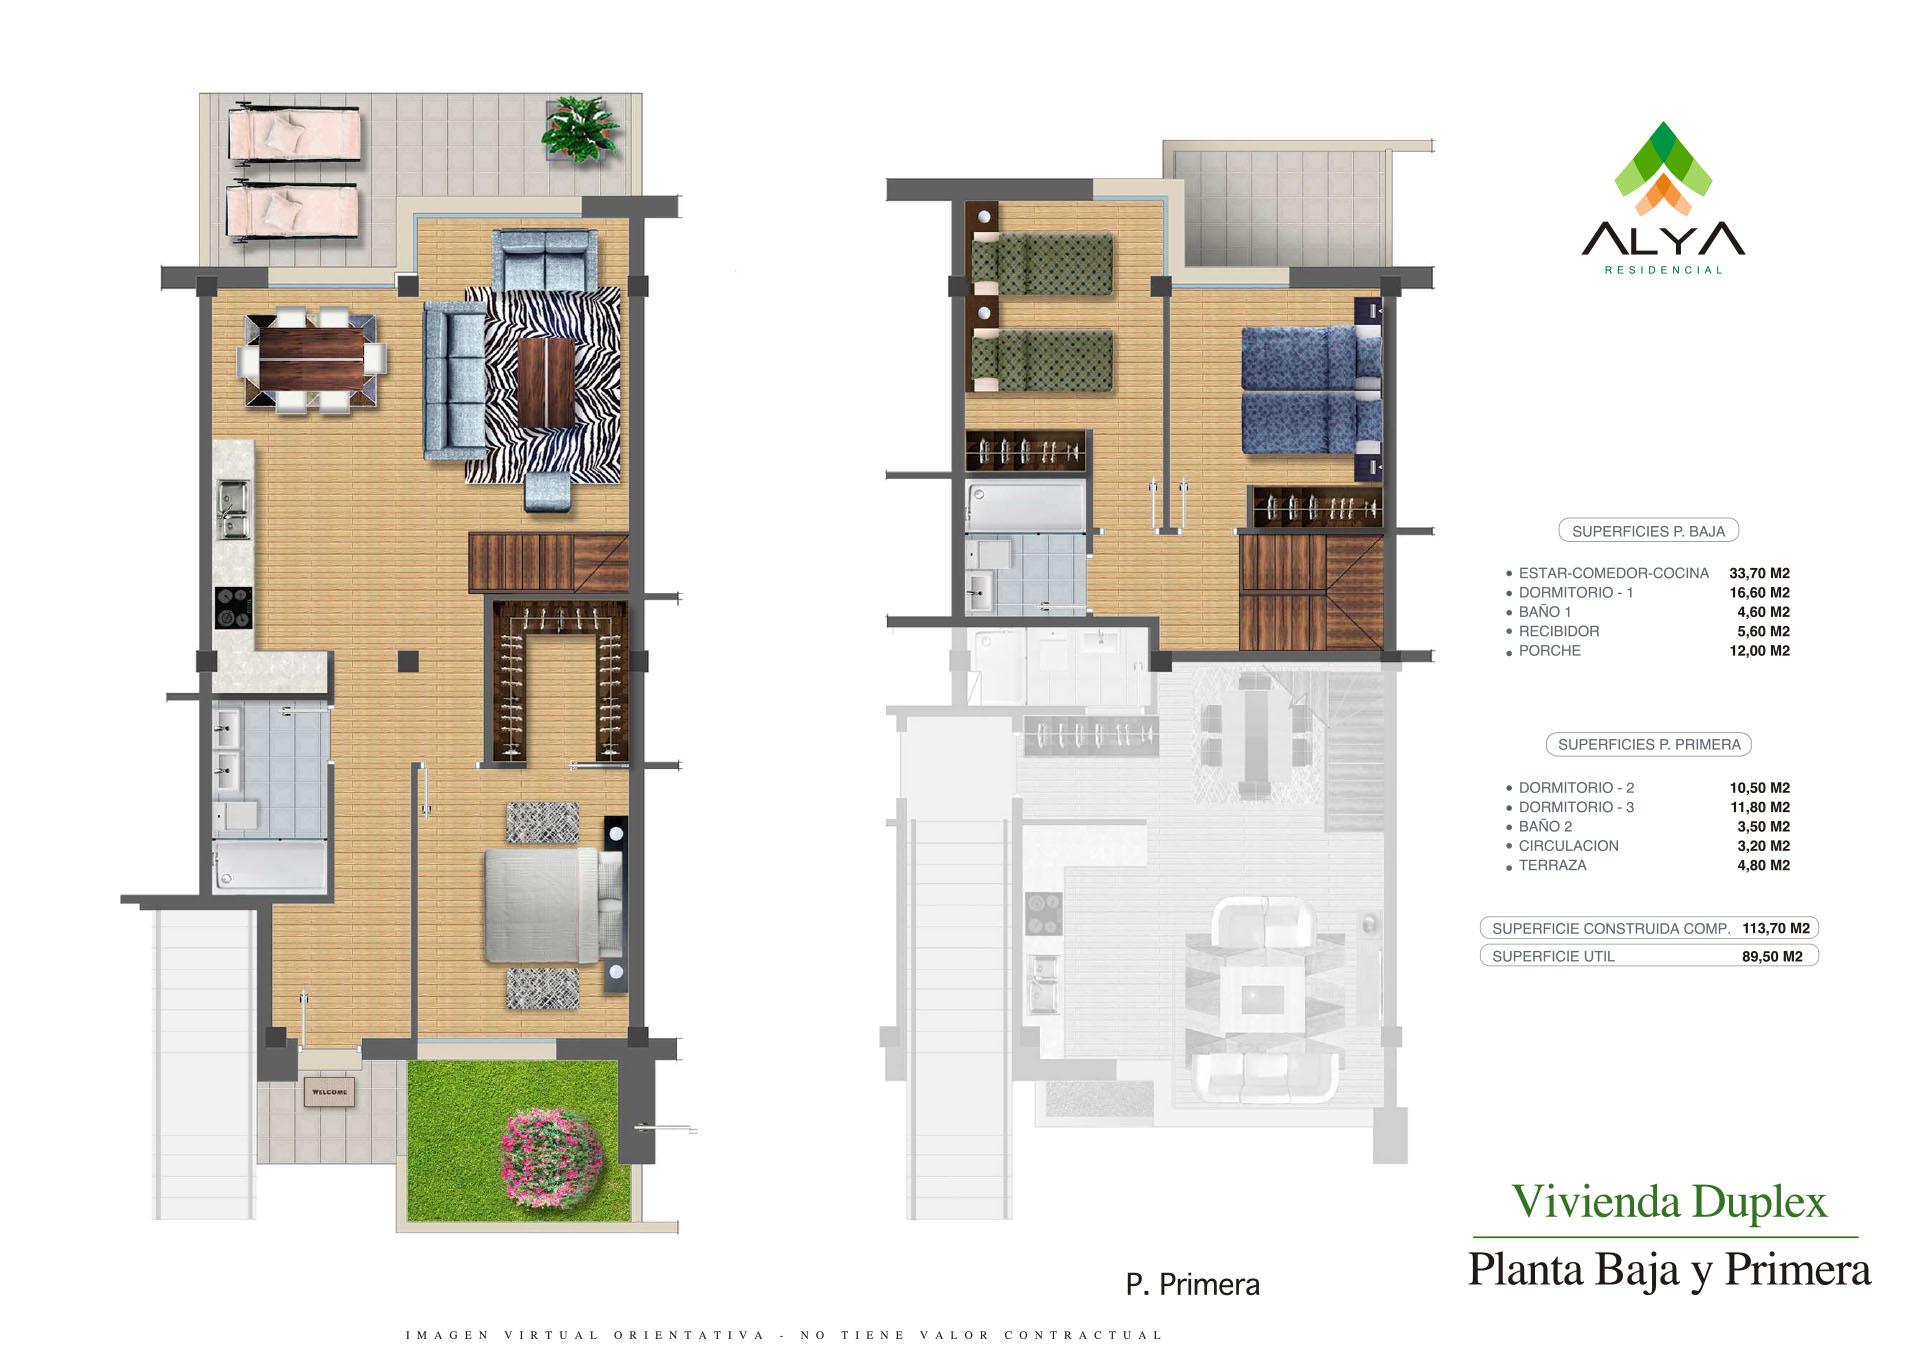 Residencial_Alya-Planta-baja-primera